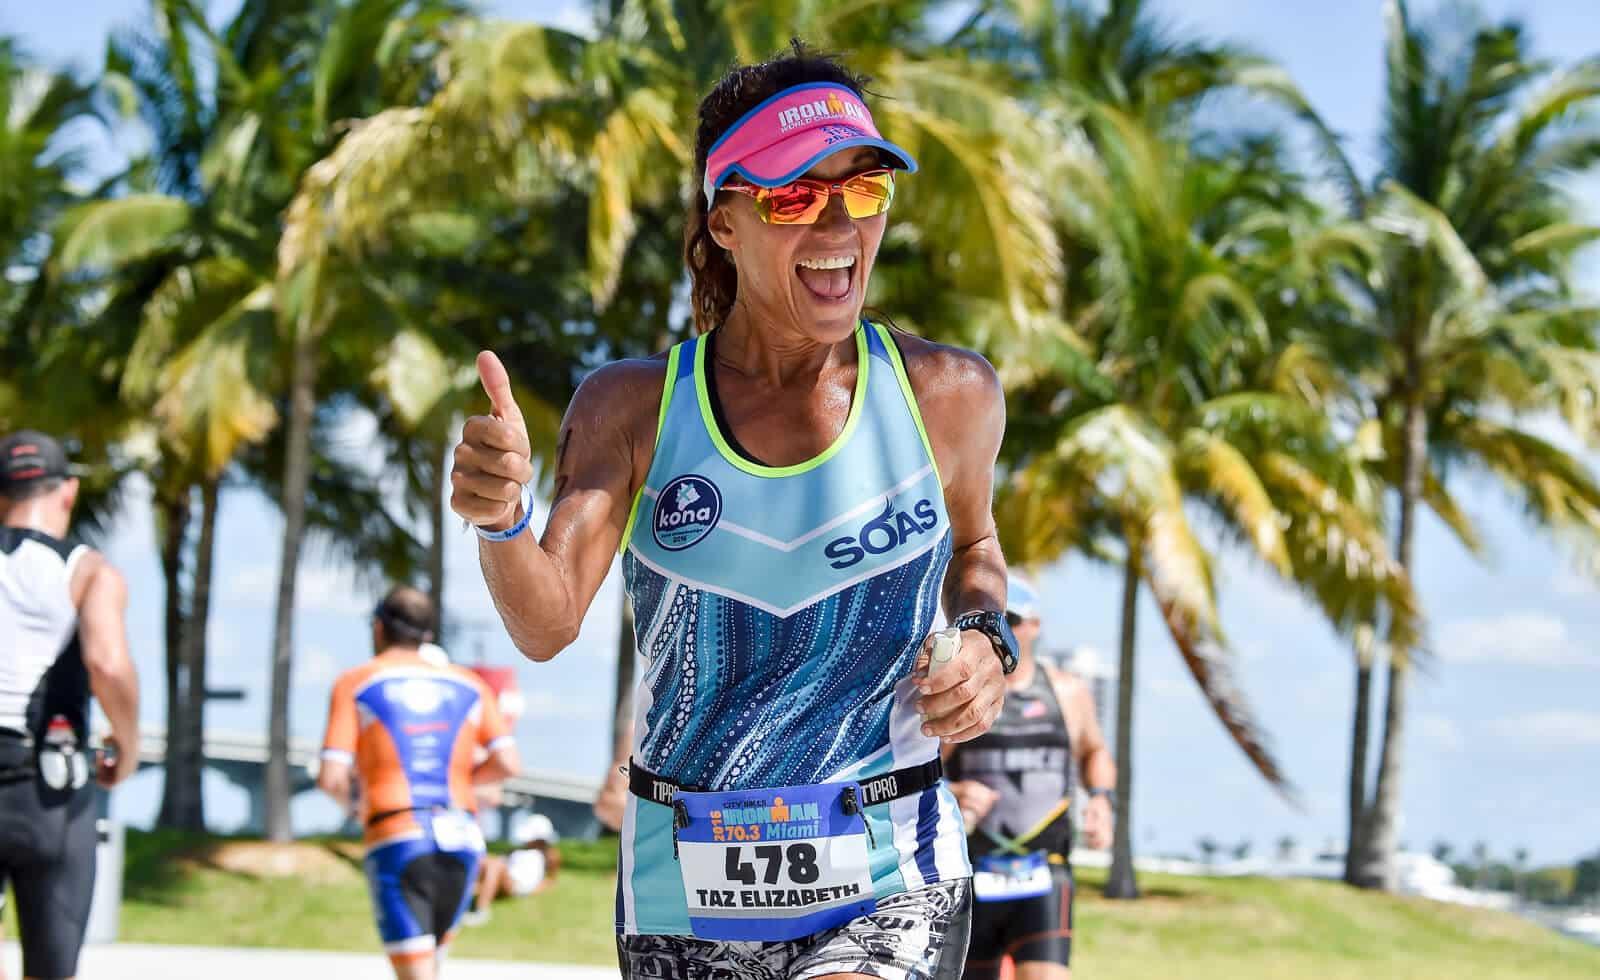 Maratona em Miami